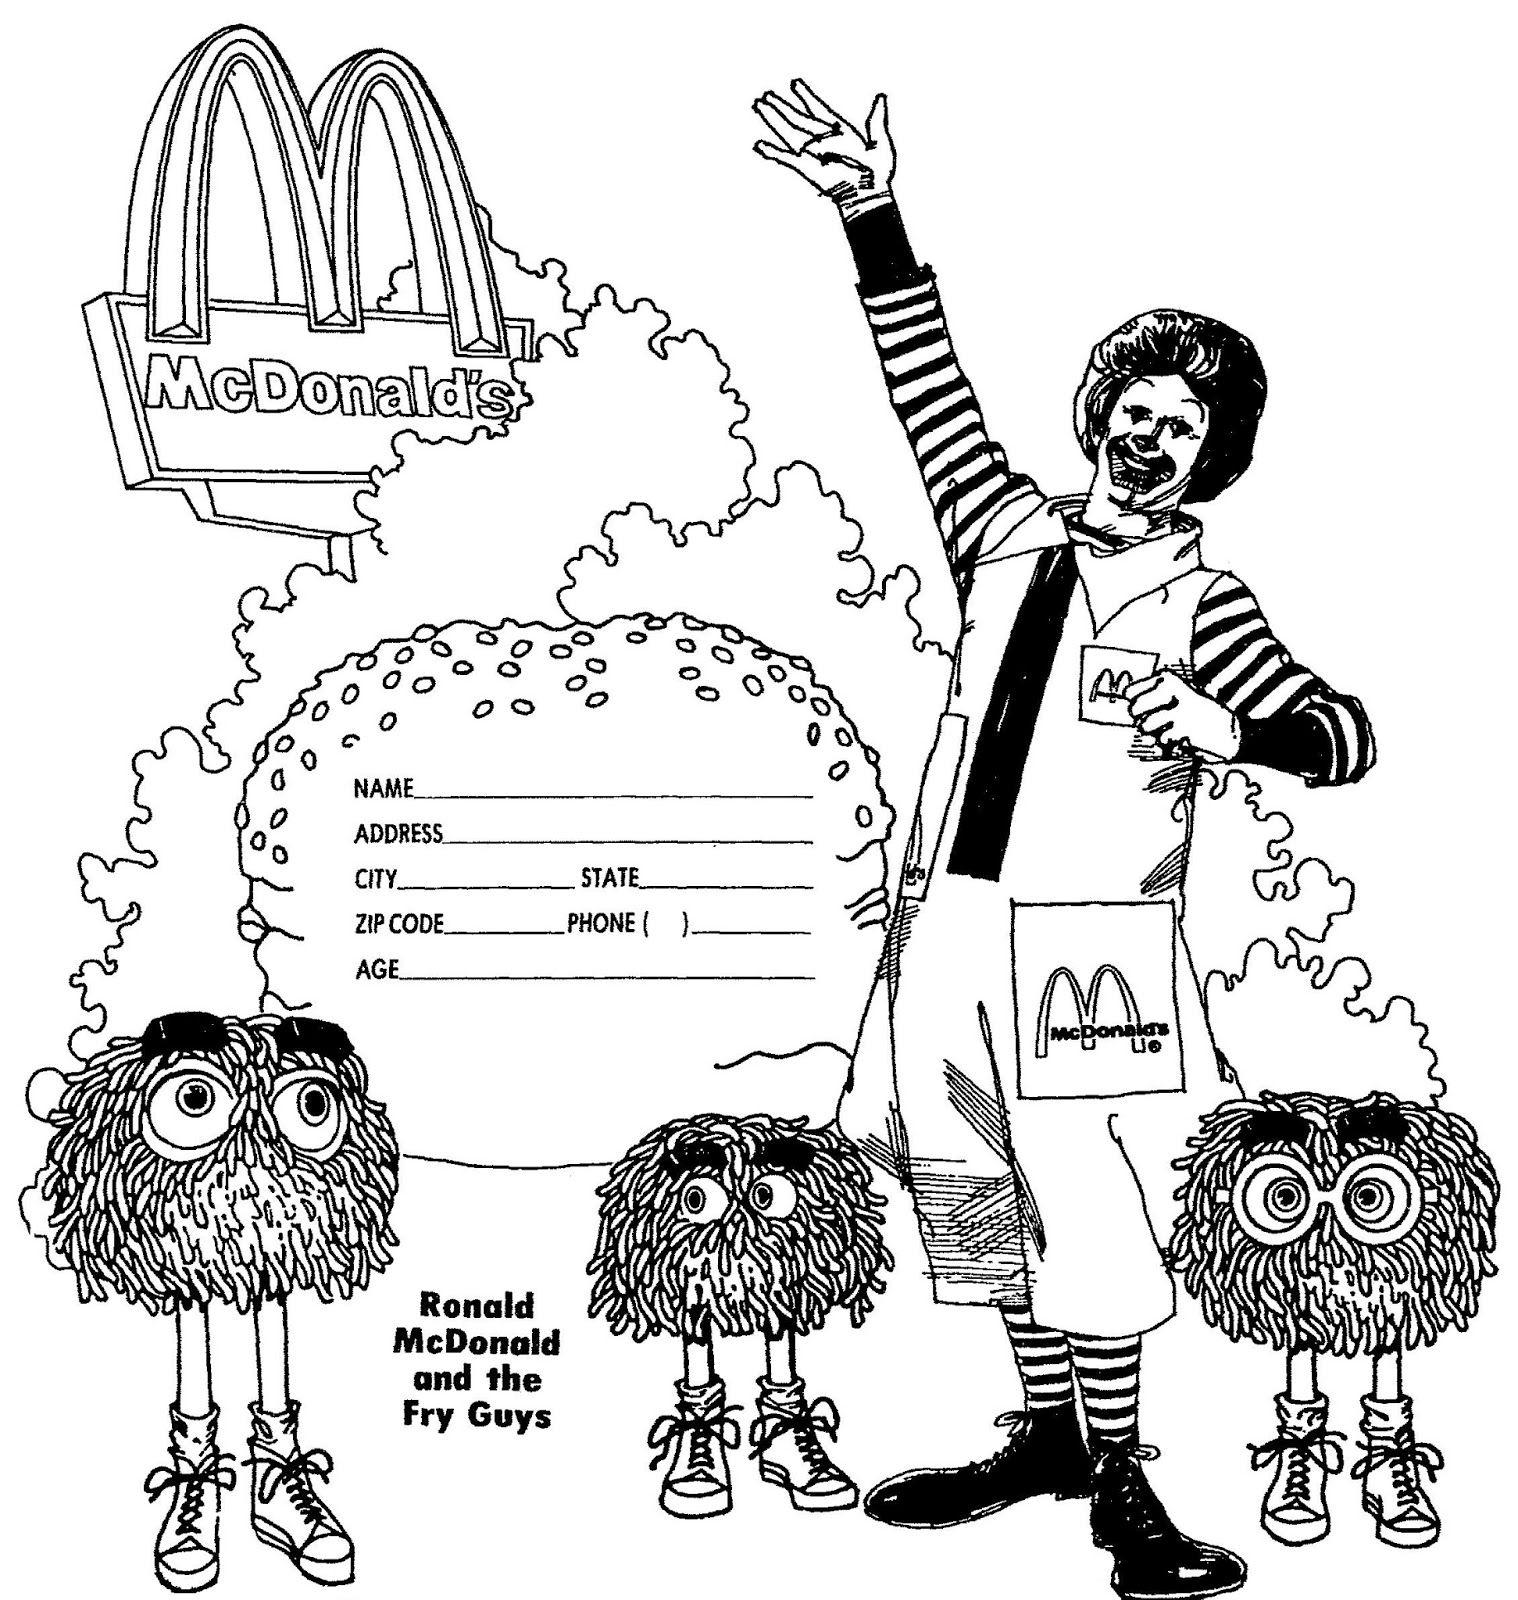 free mcdonalds coloring pages | mcdonalds coloring page | Coloring pages, Coloring pages ...